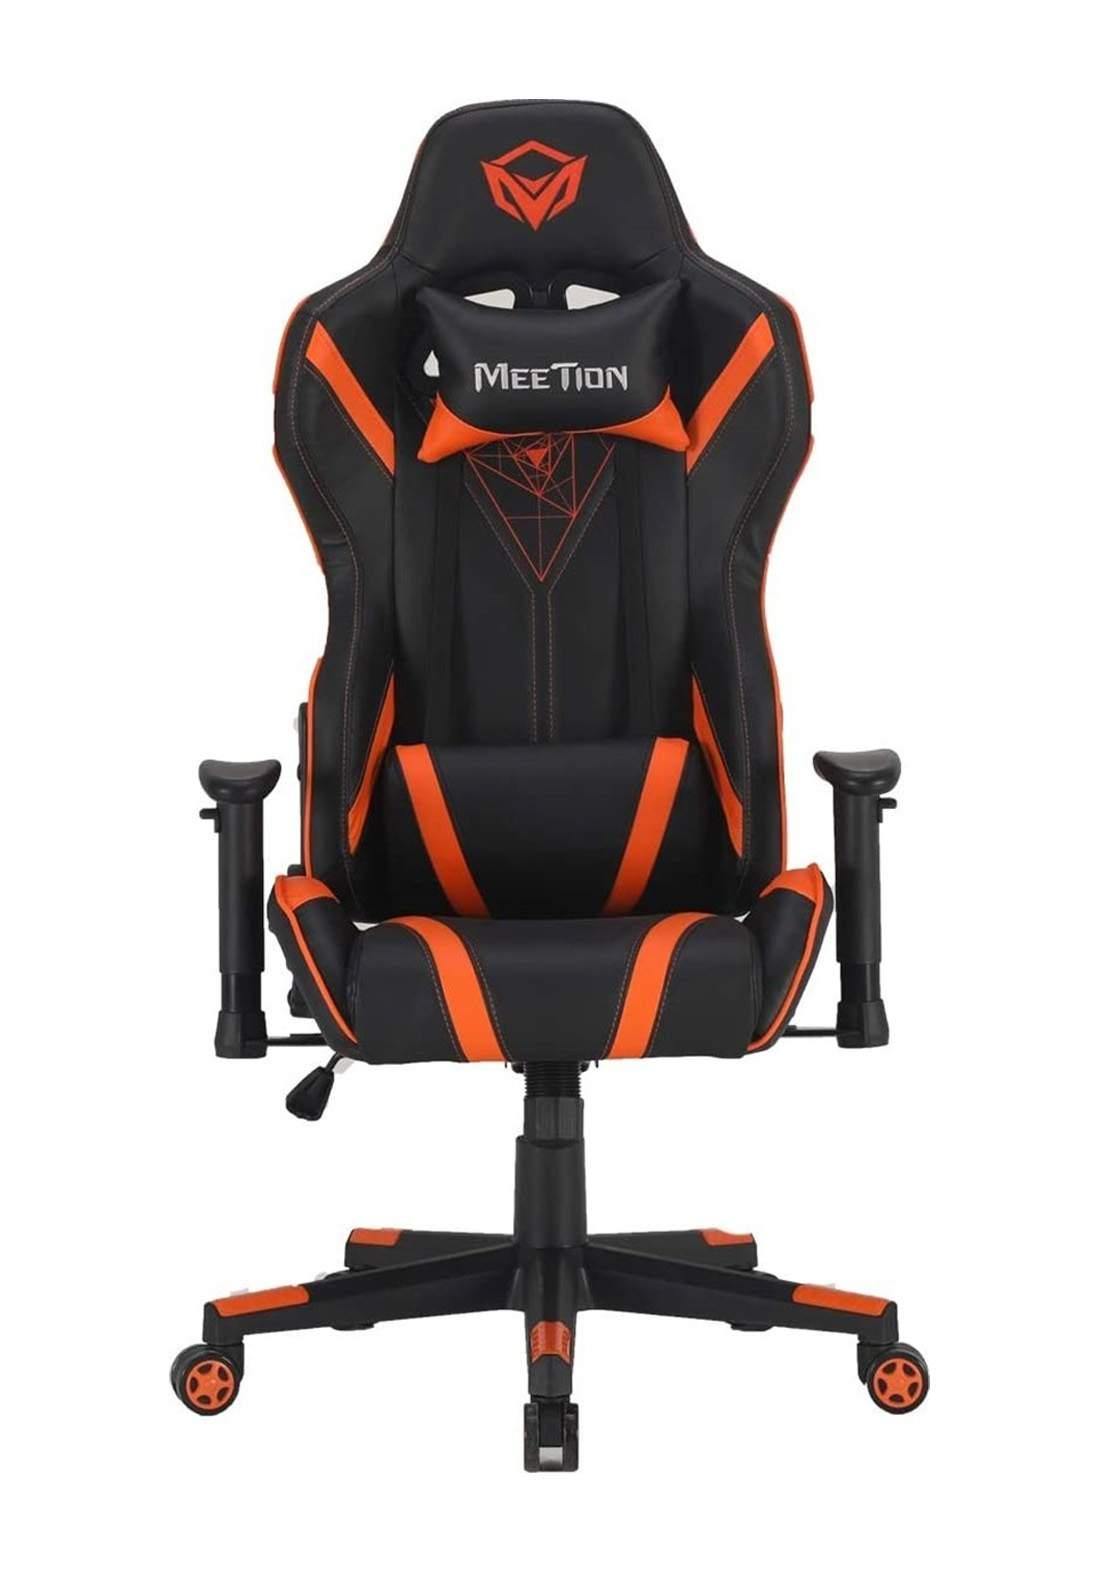 Meetion MT-CHR15 180 ° Adjustable Gaming Chair كرسي ألعاب